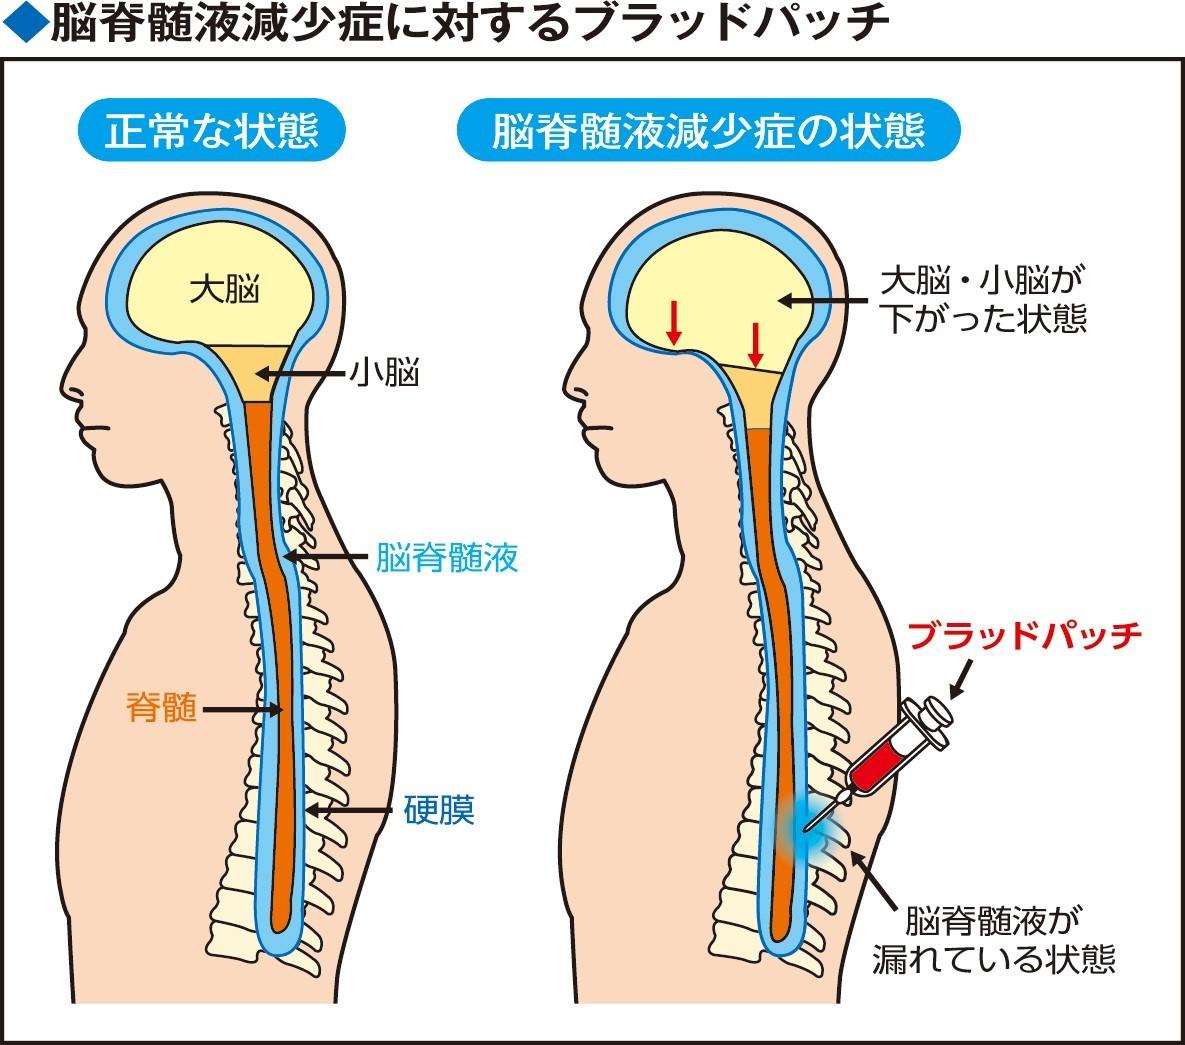 https://medical.jiji.com/images/image/topics/ce266c80b84963aef9da404a21d51aa8.jpeg